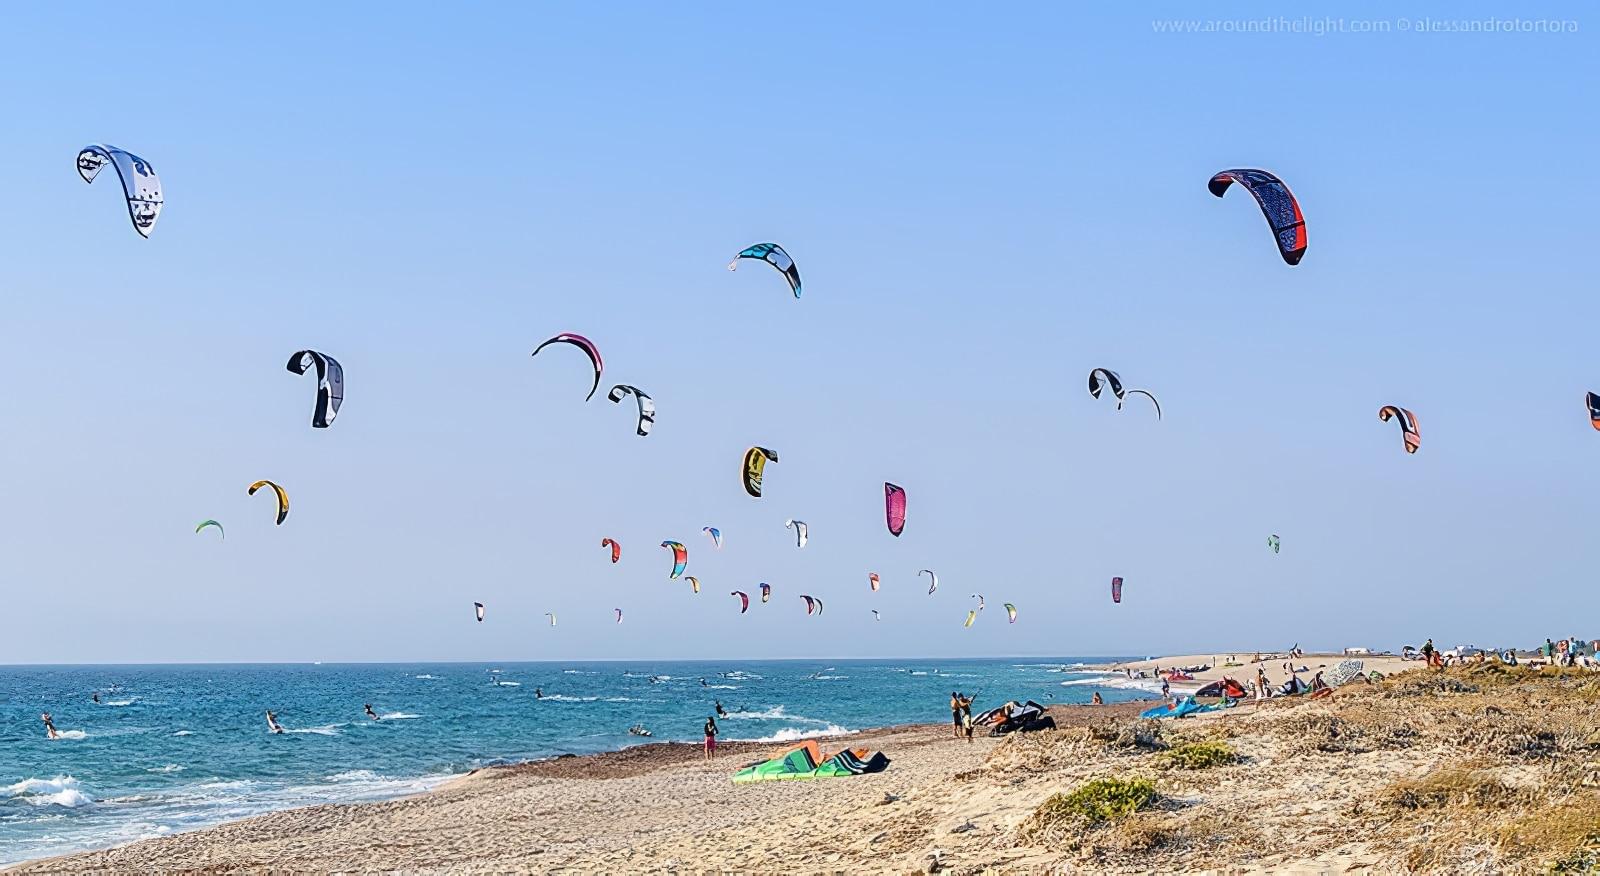 Kitesurf à Lefkada, en Grèce